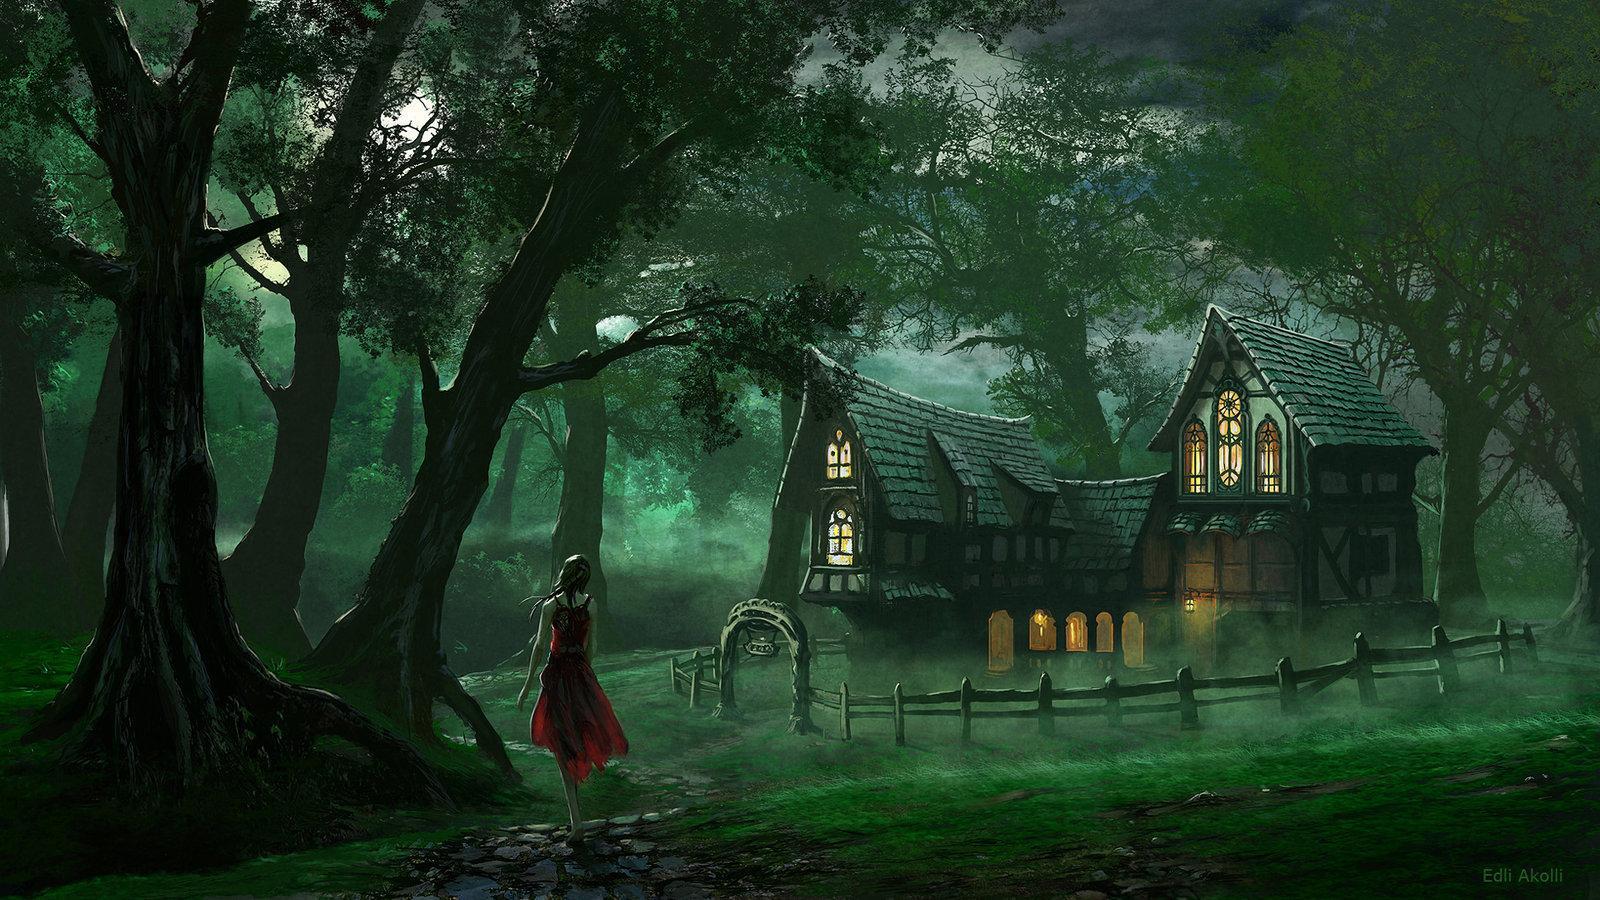 The Inn by ~Edli